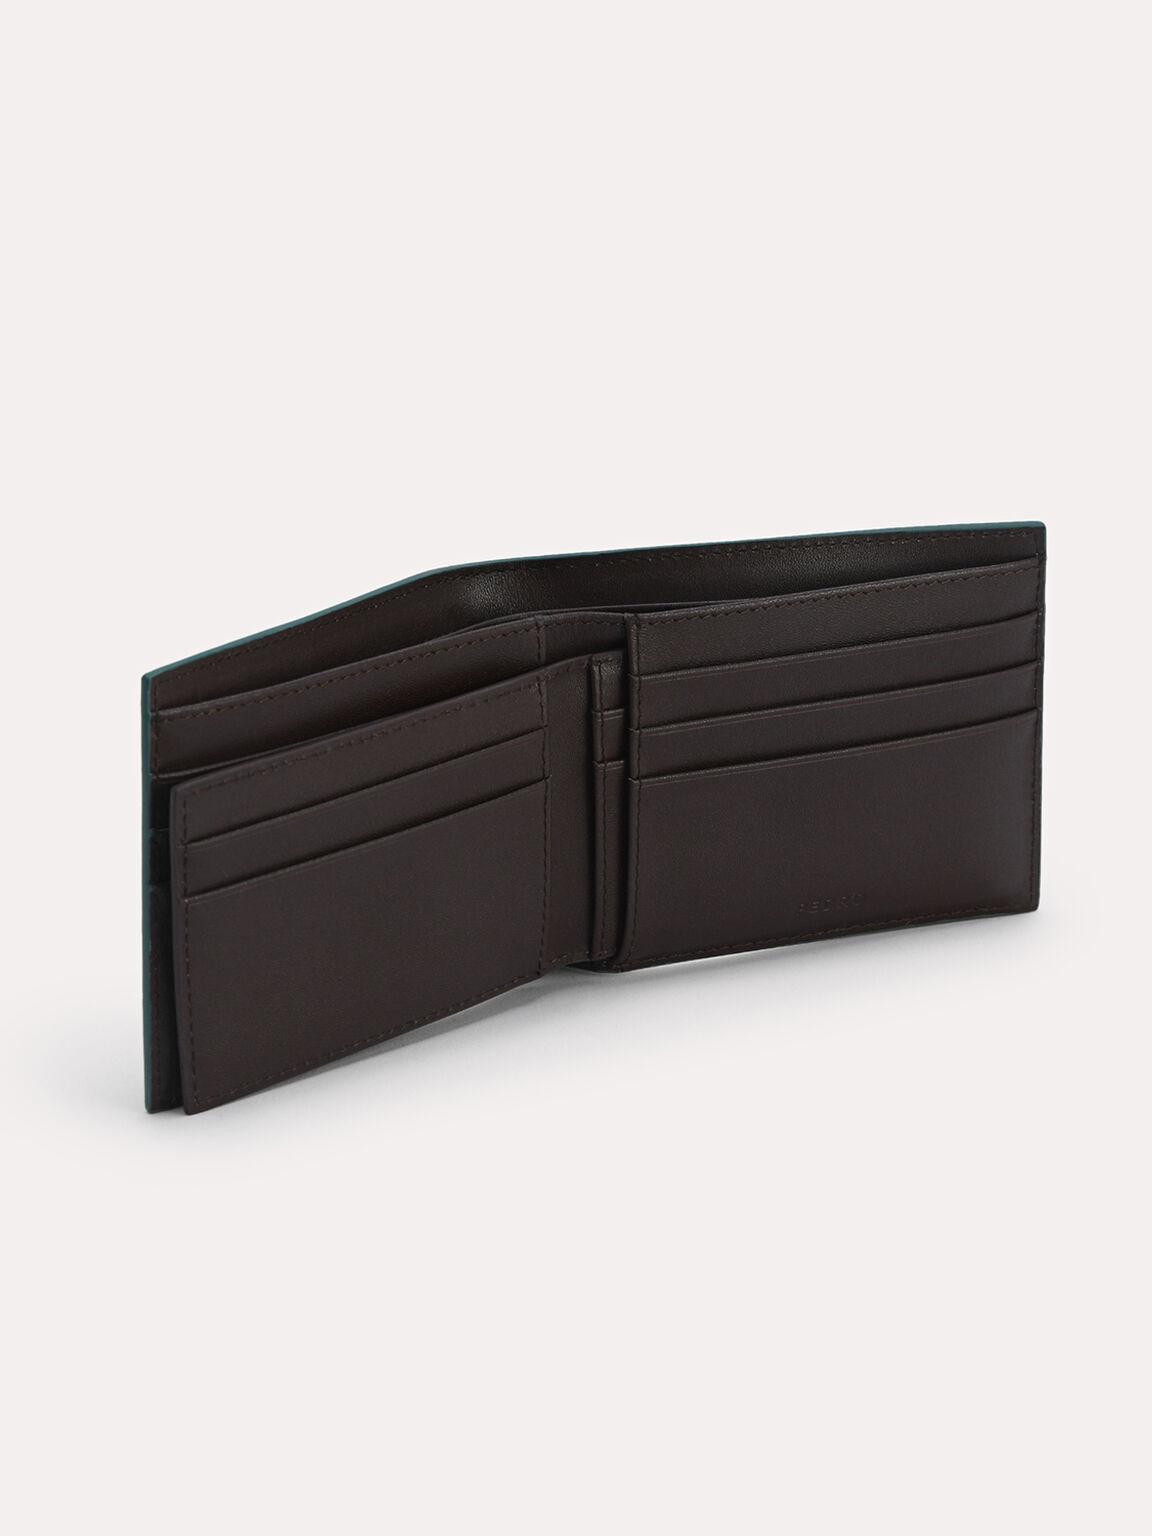 Leather Bi-Fold Wallet with Insert, Dark Green, hi-res